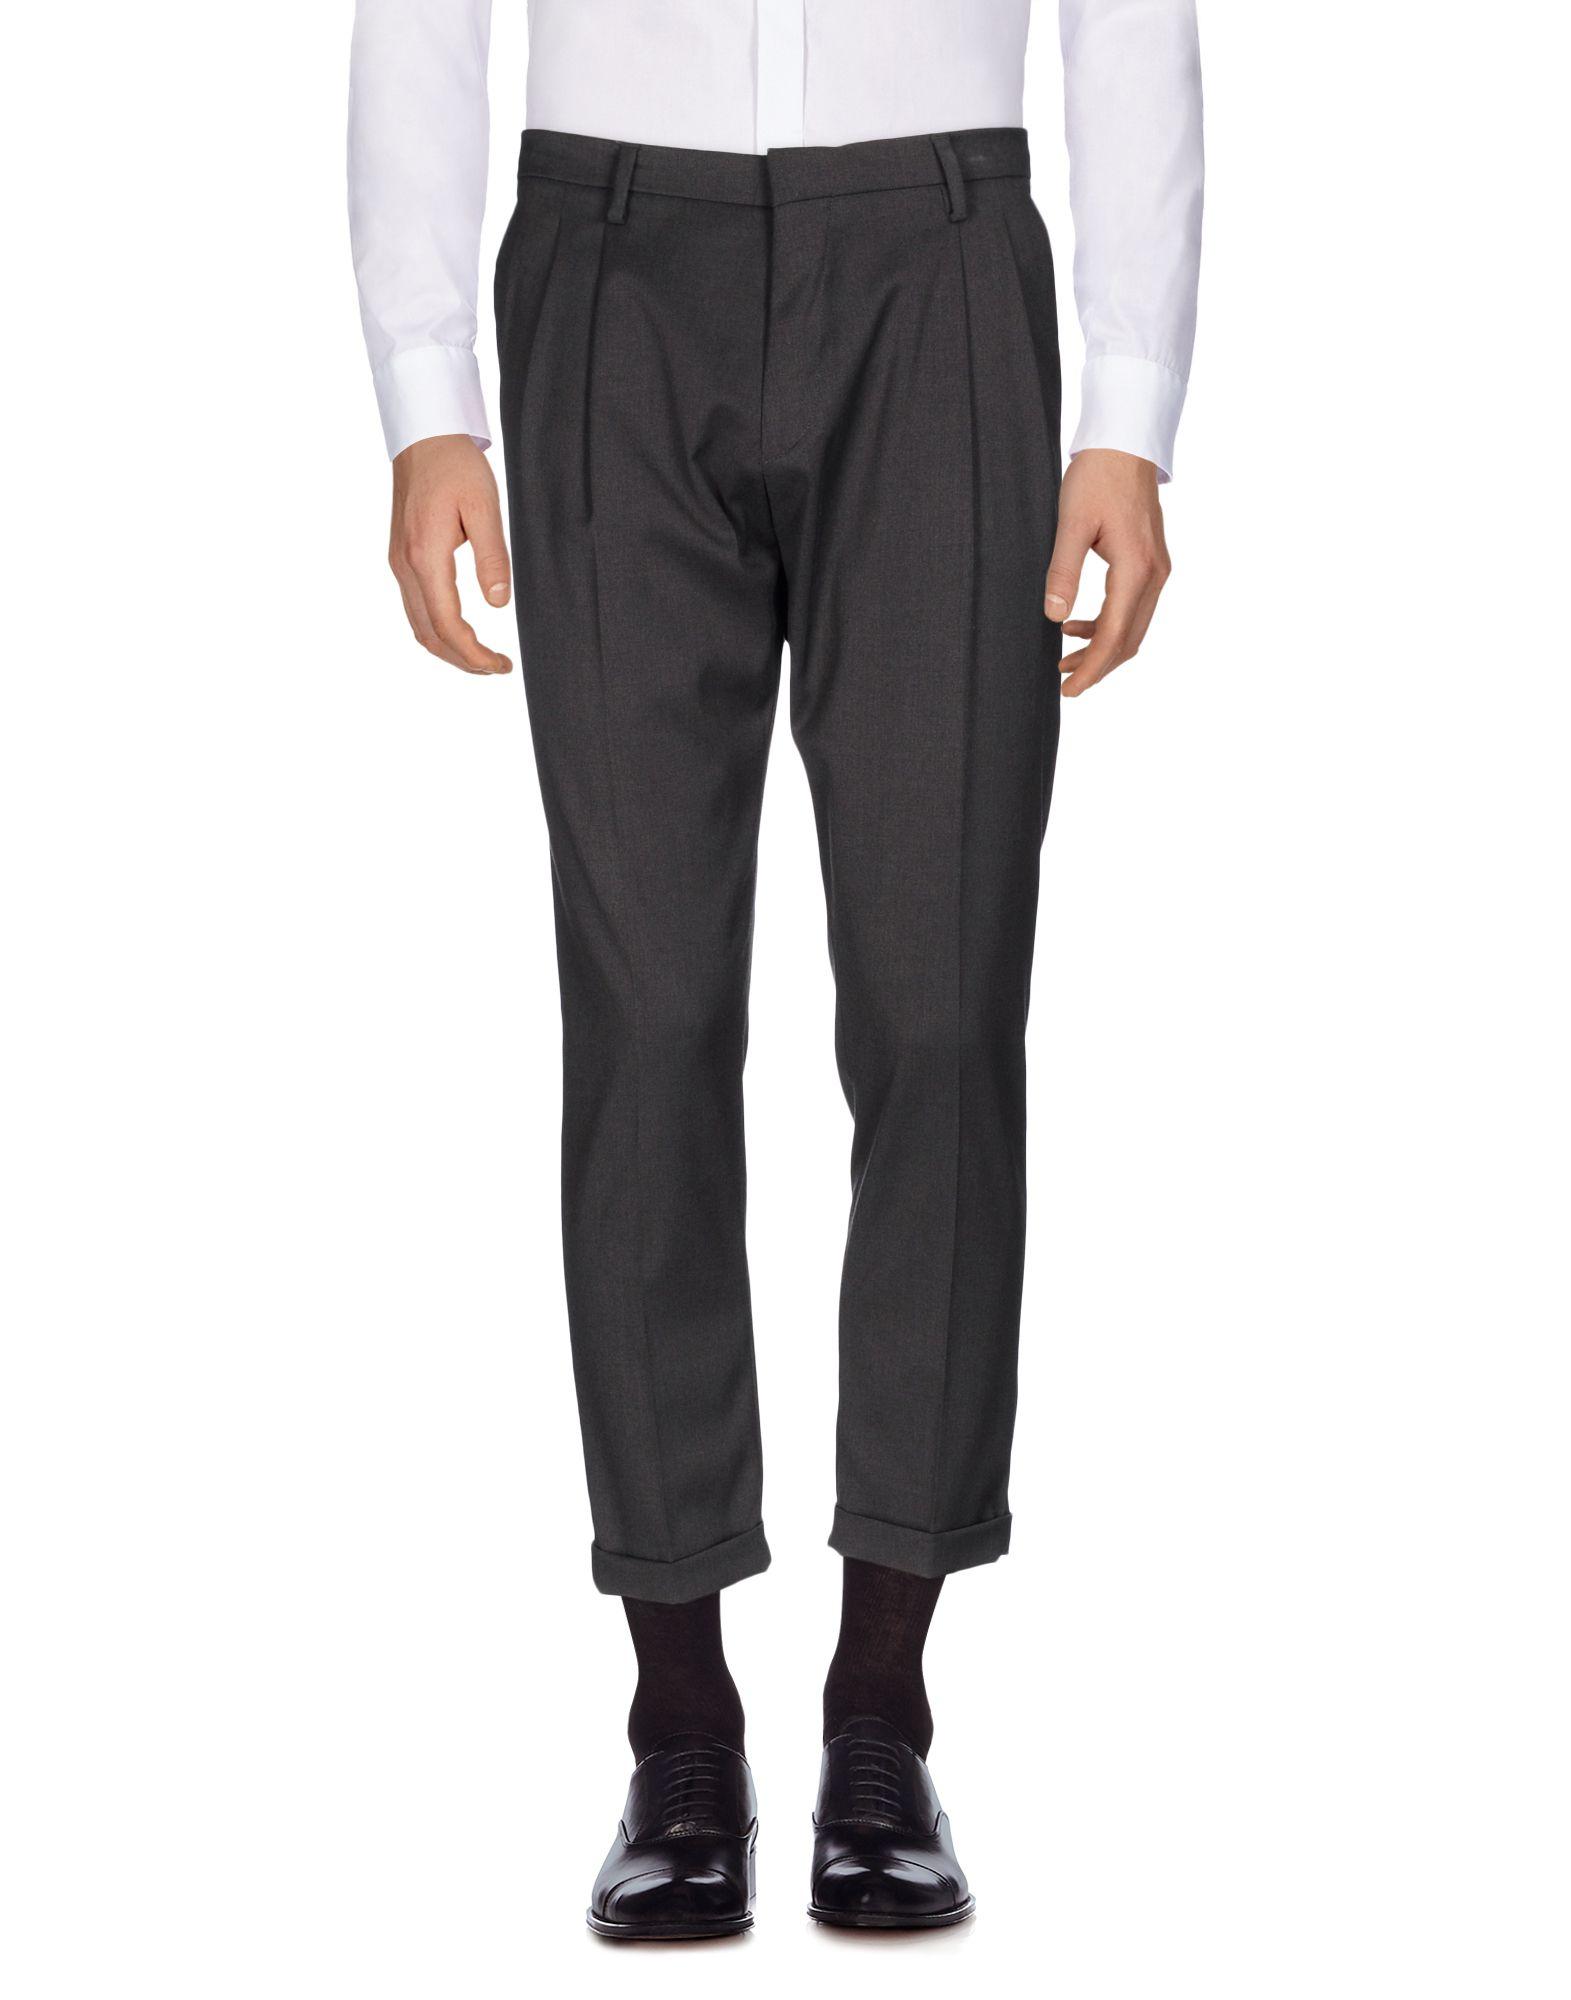 Pantalone Giggle Uomo - Acquista online su